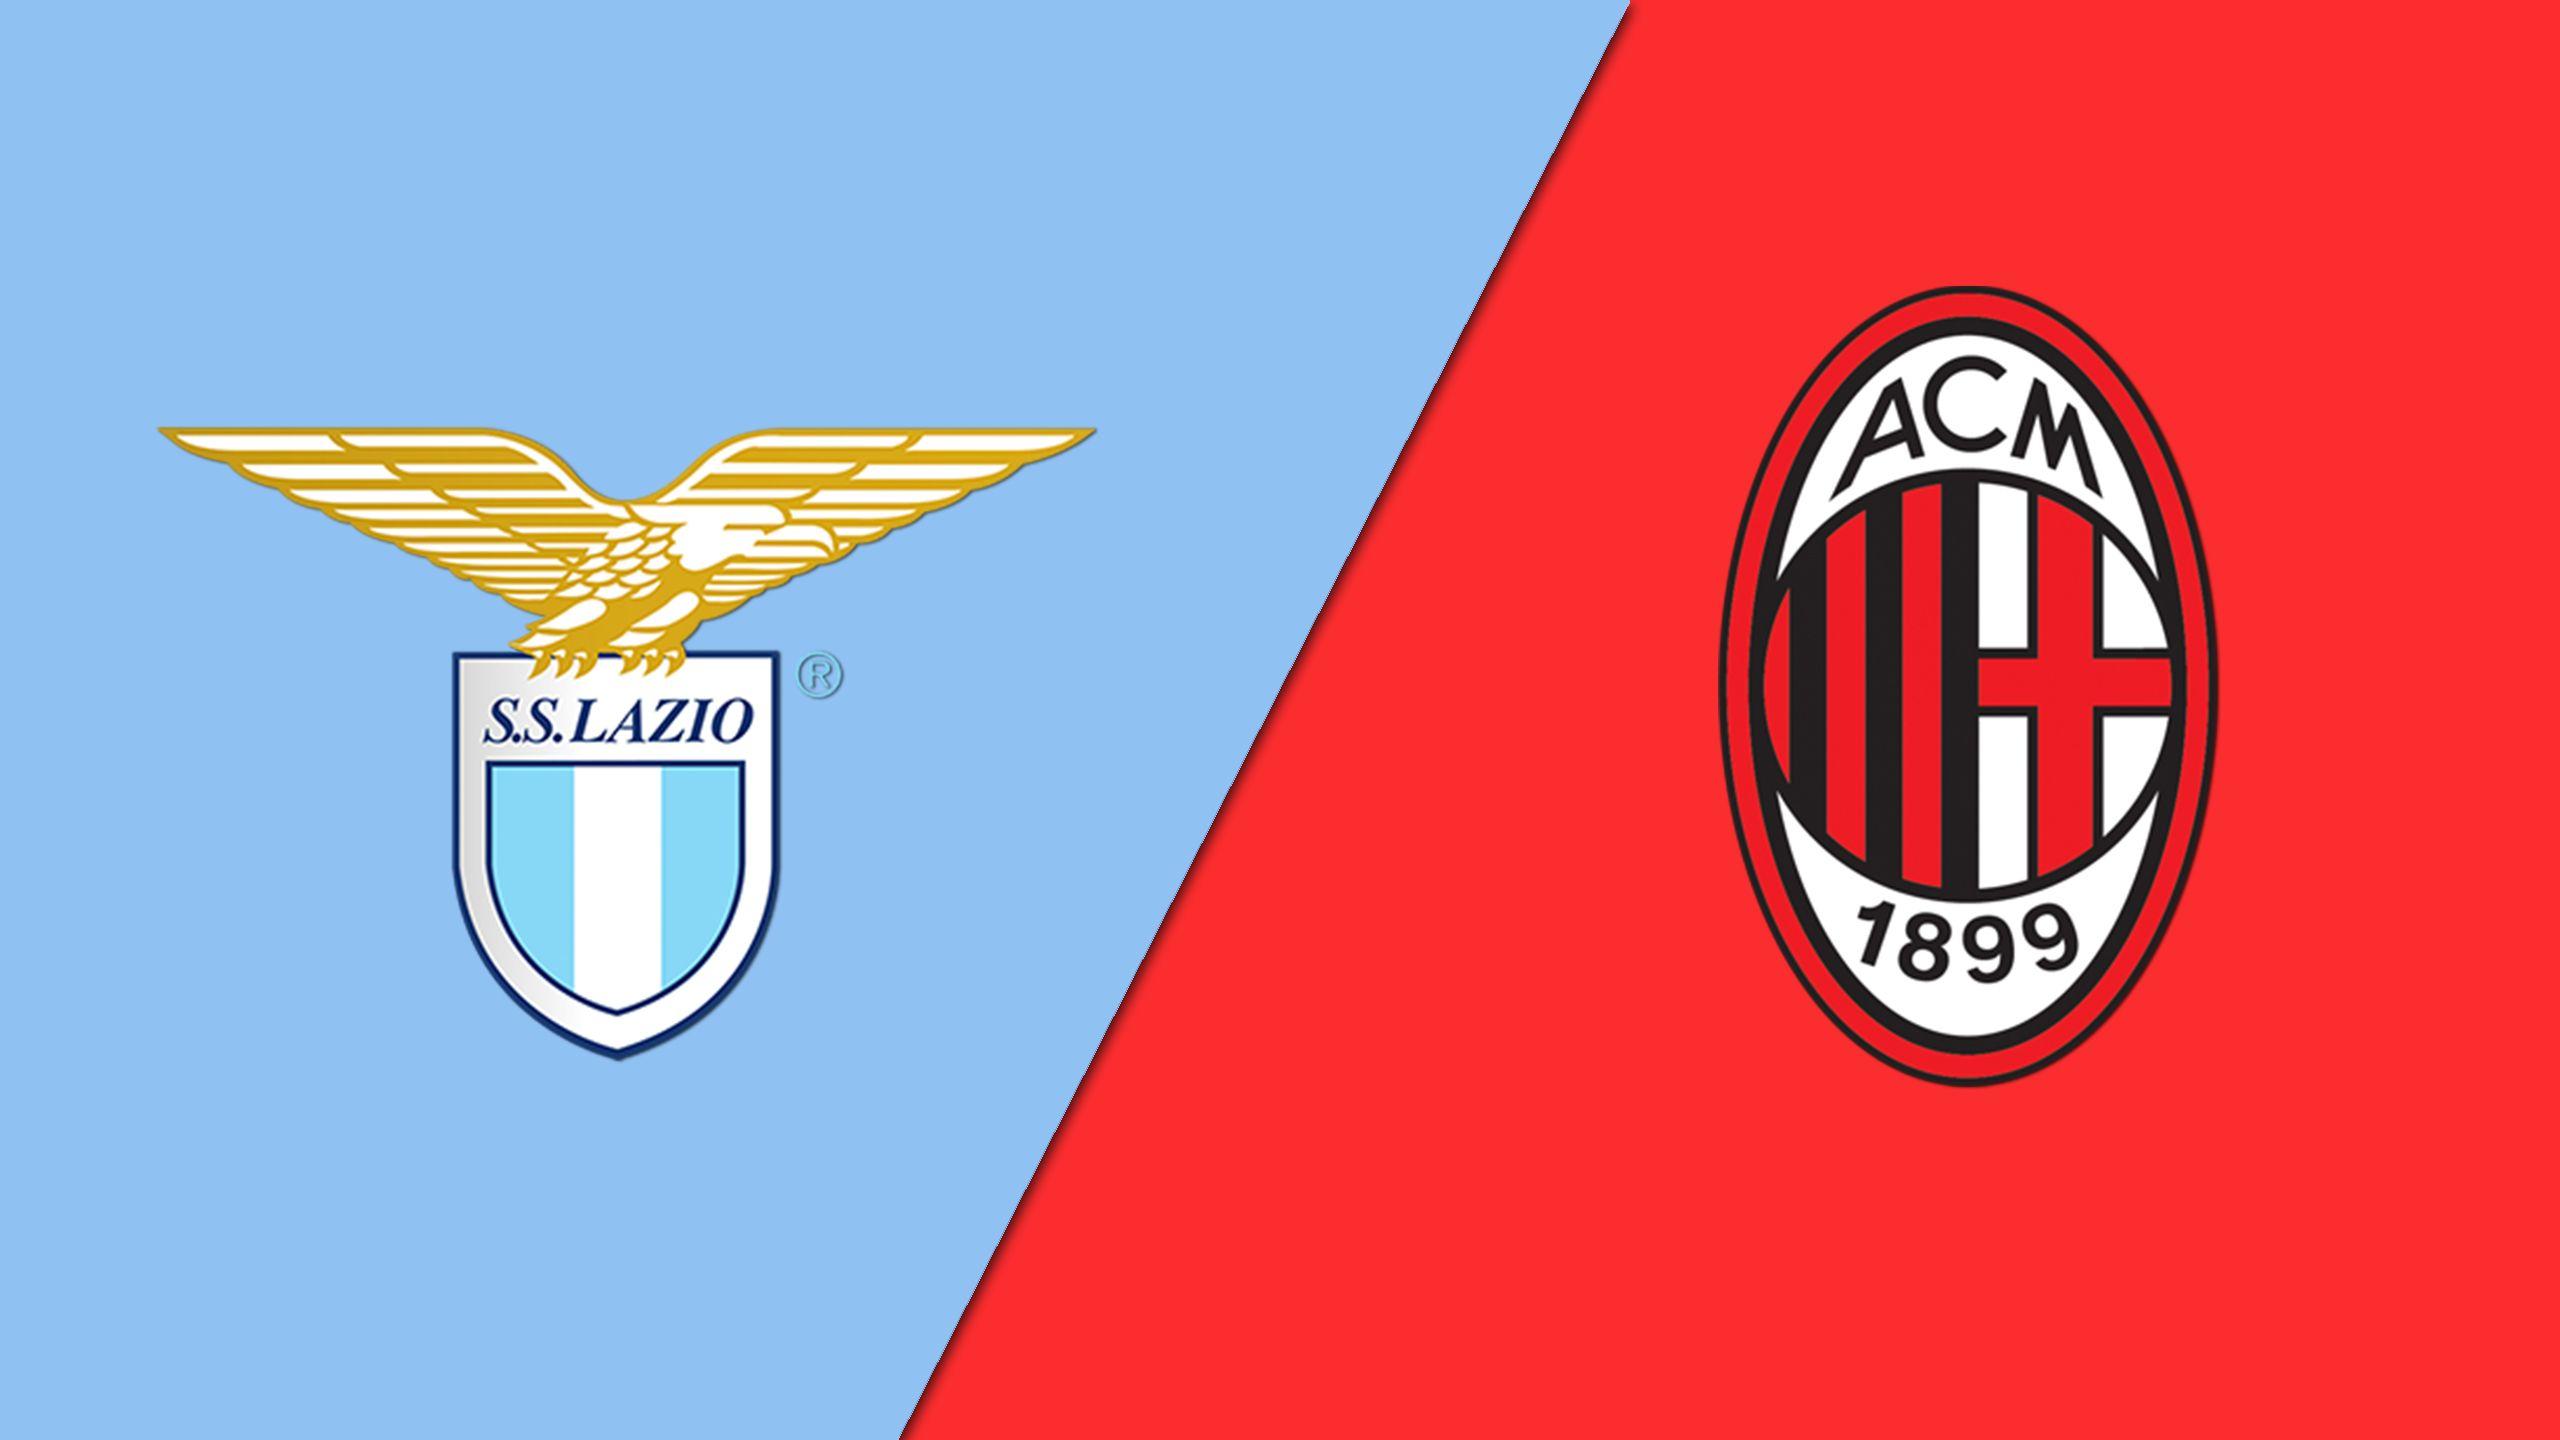 Lazio vs. AC Milan